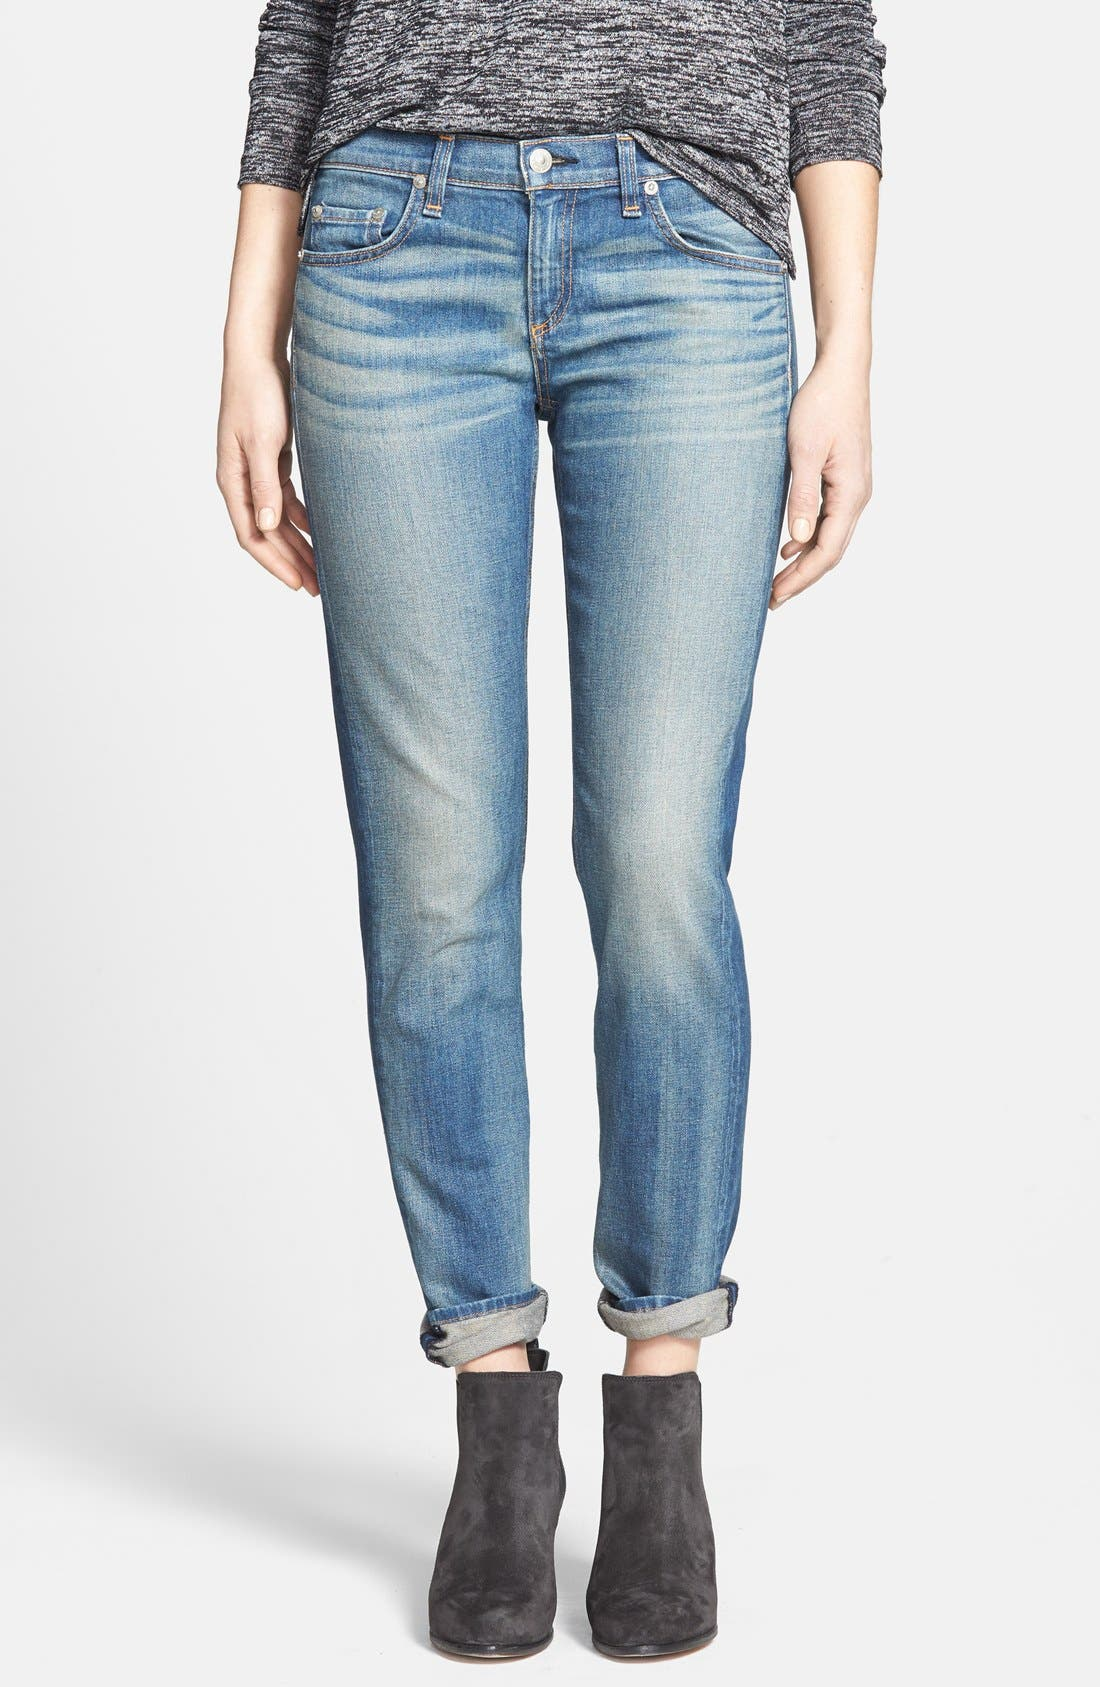 Alternate Image 1 Selected - rag & bone/JEAN 'The Dre' Slim Fit Boyfriend Jeans (Golden) (Nordstrom Exclusive)